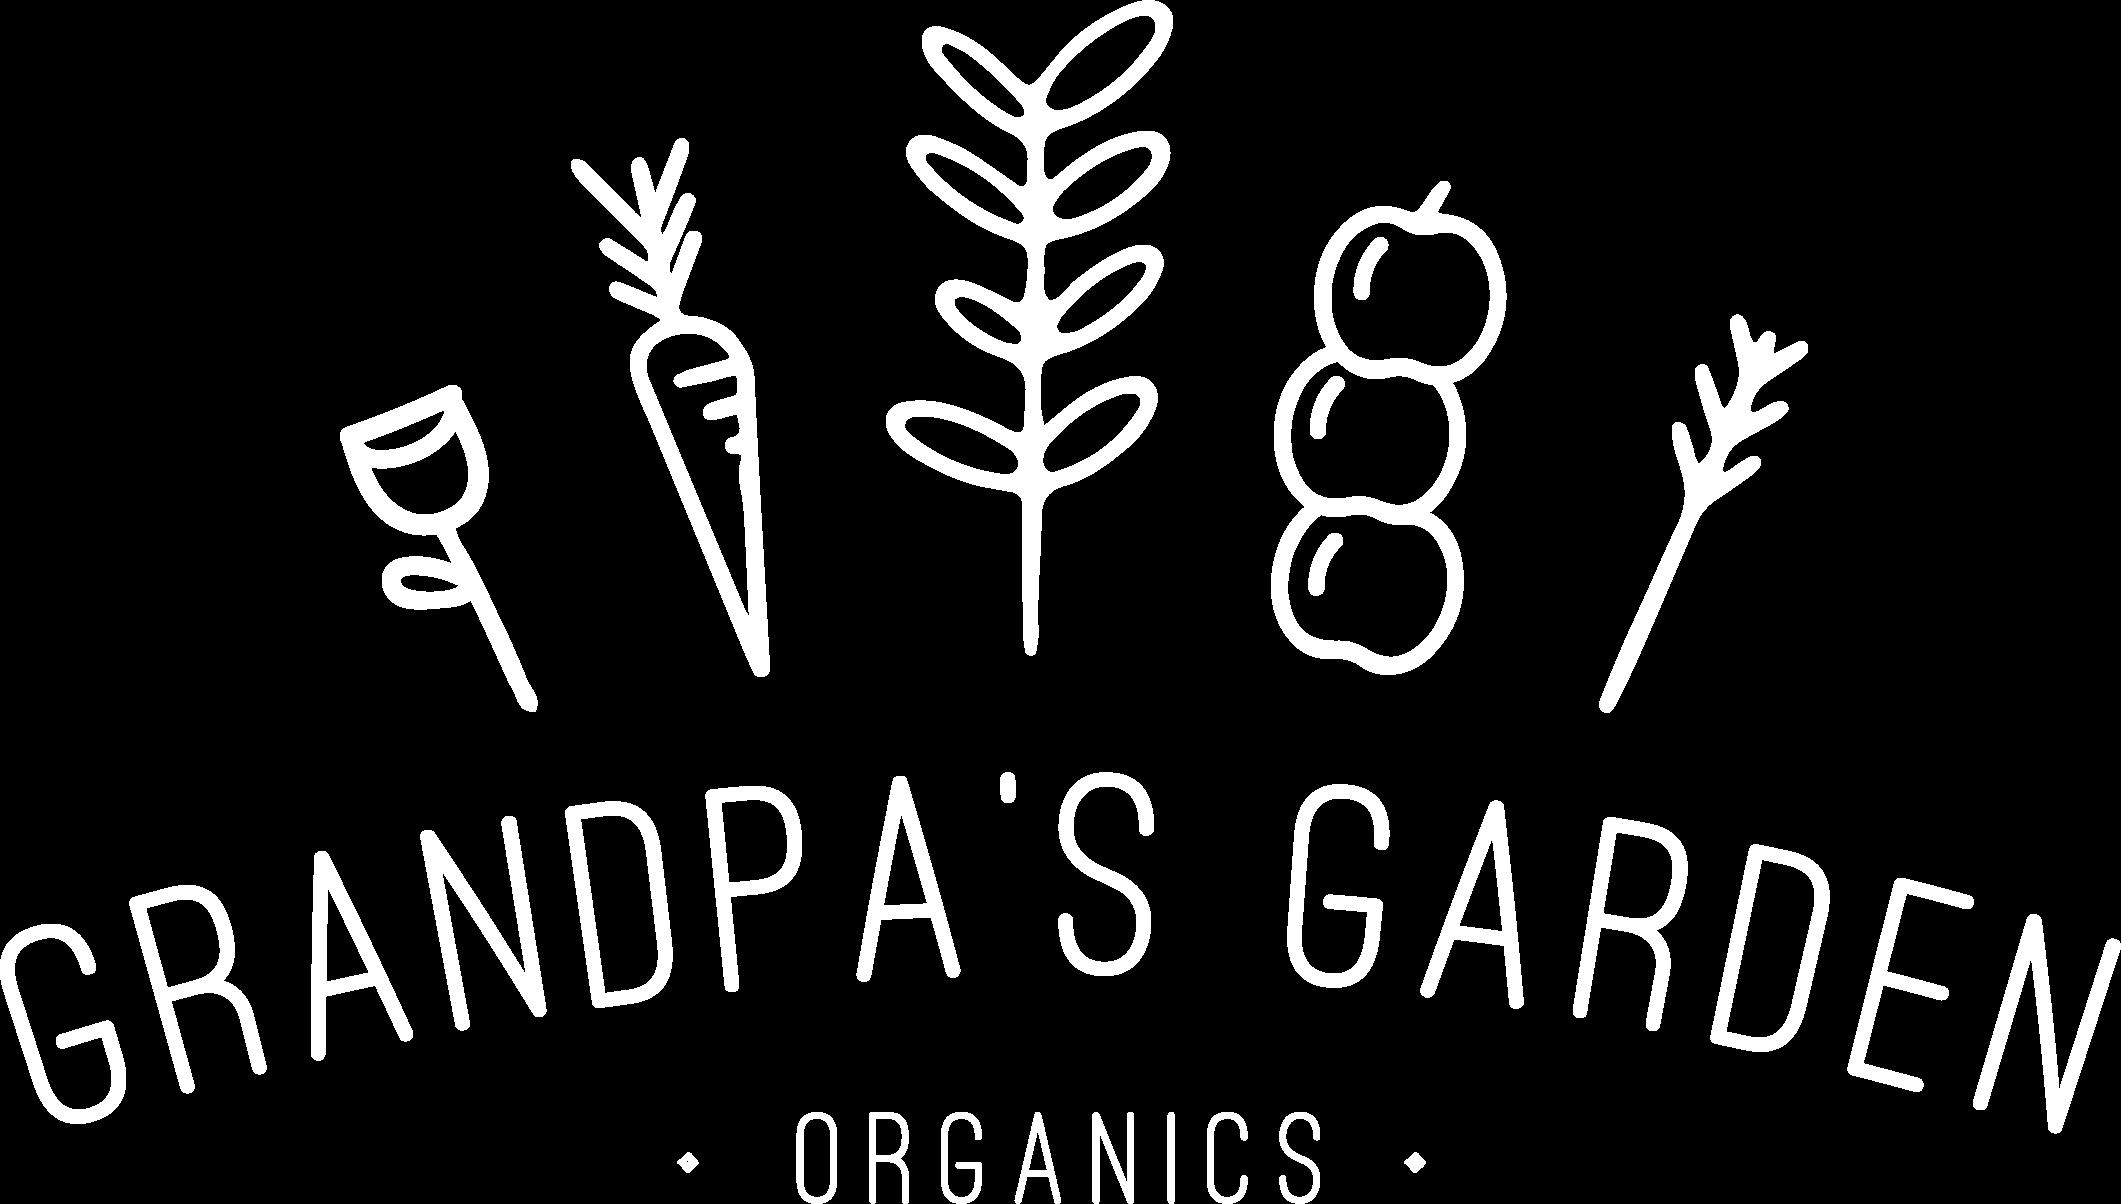 Grandpa's Garden Organics